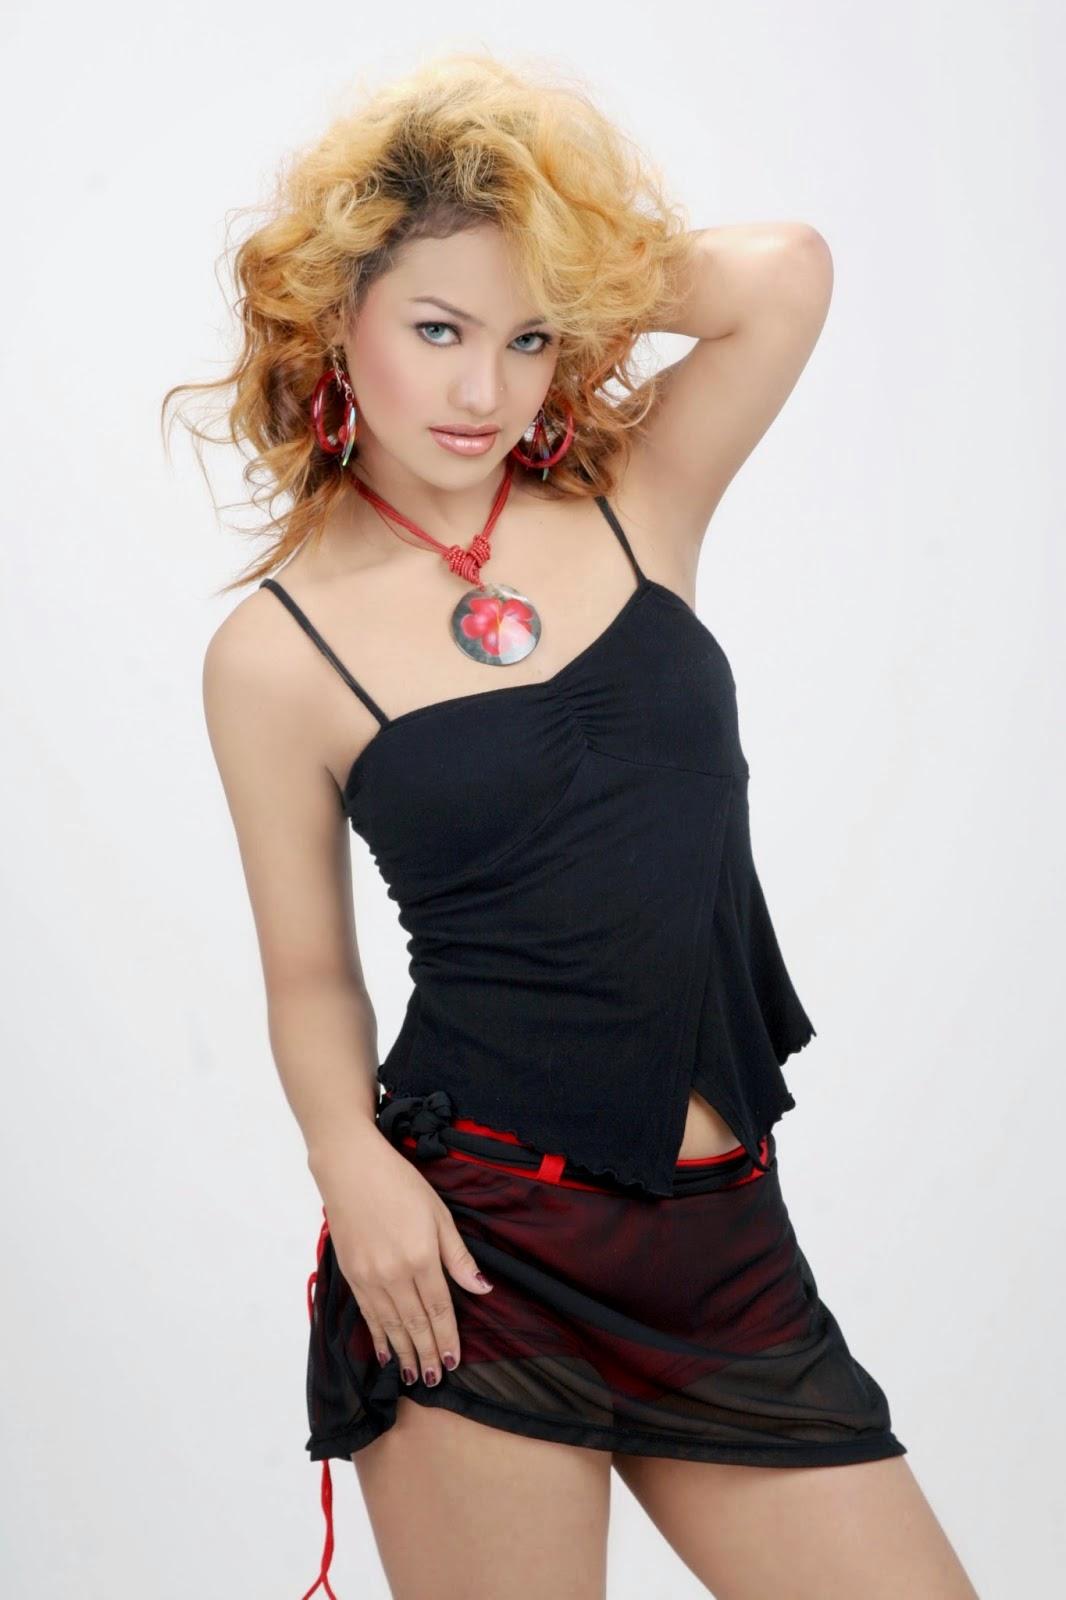 Indonesian dangdut singer behind the scene - 2 9